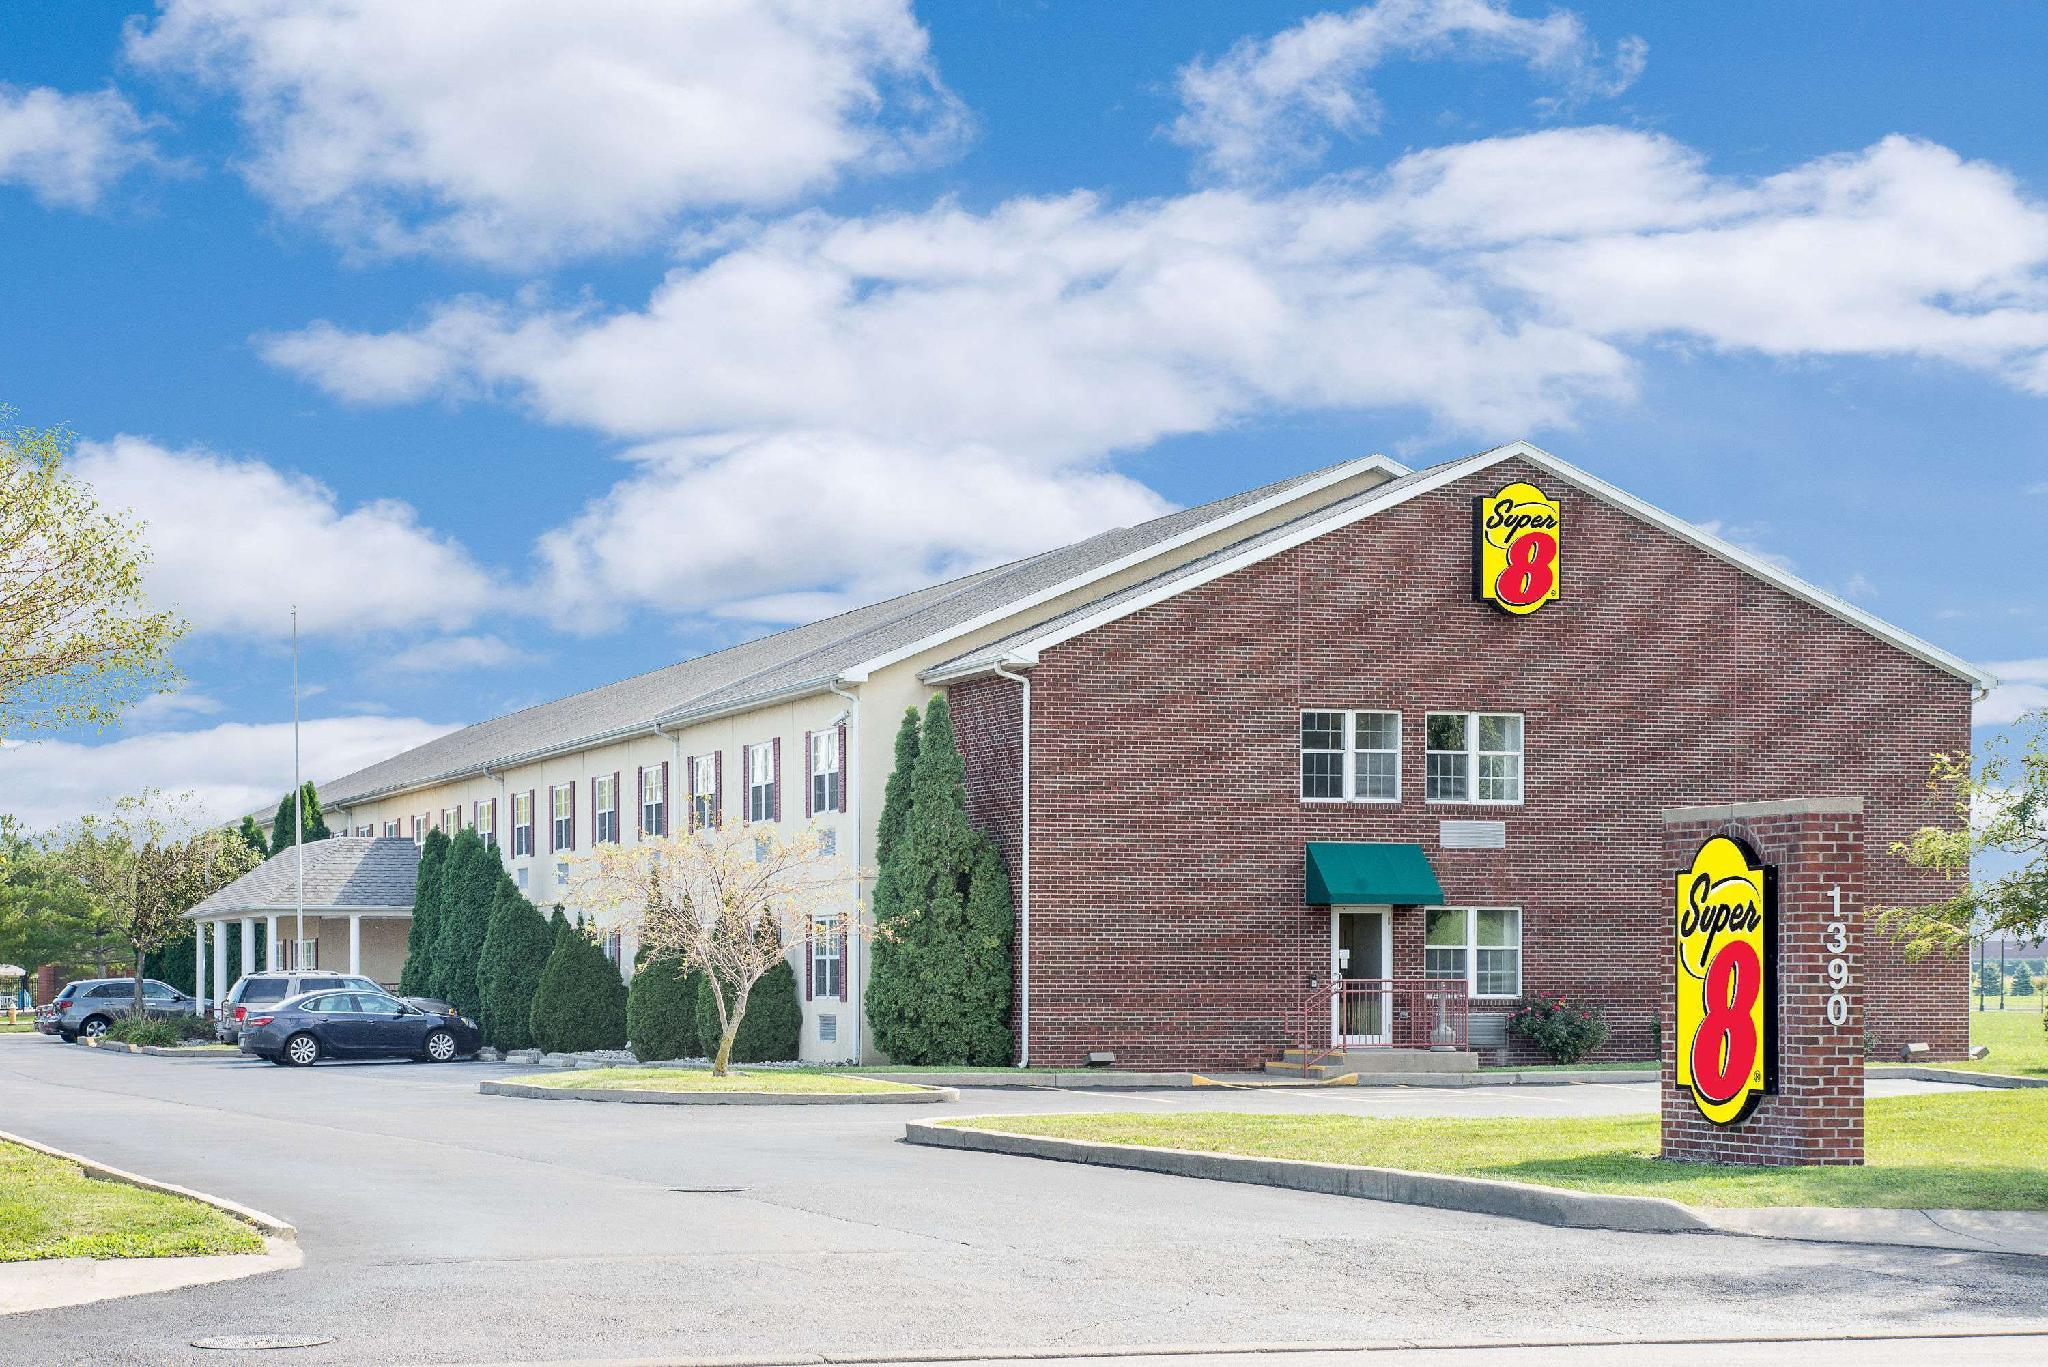 Super 8 By Wyndham Maumee Perrysburg Toledo Area